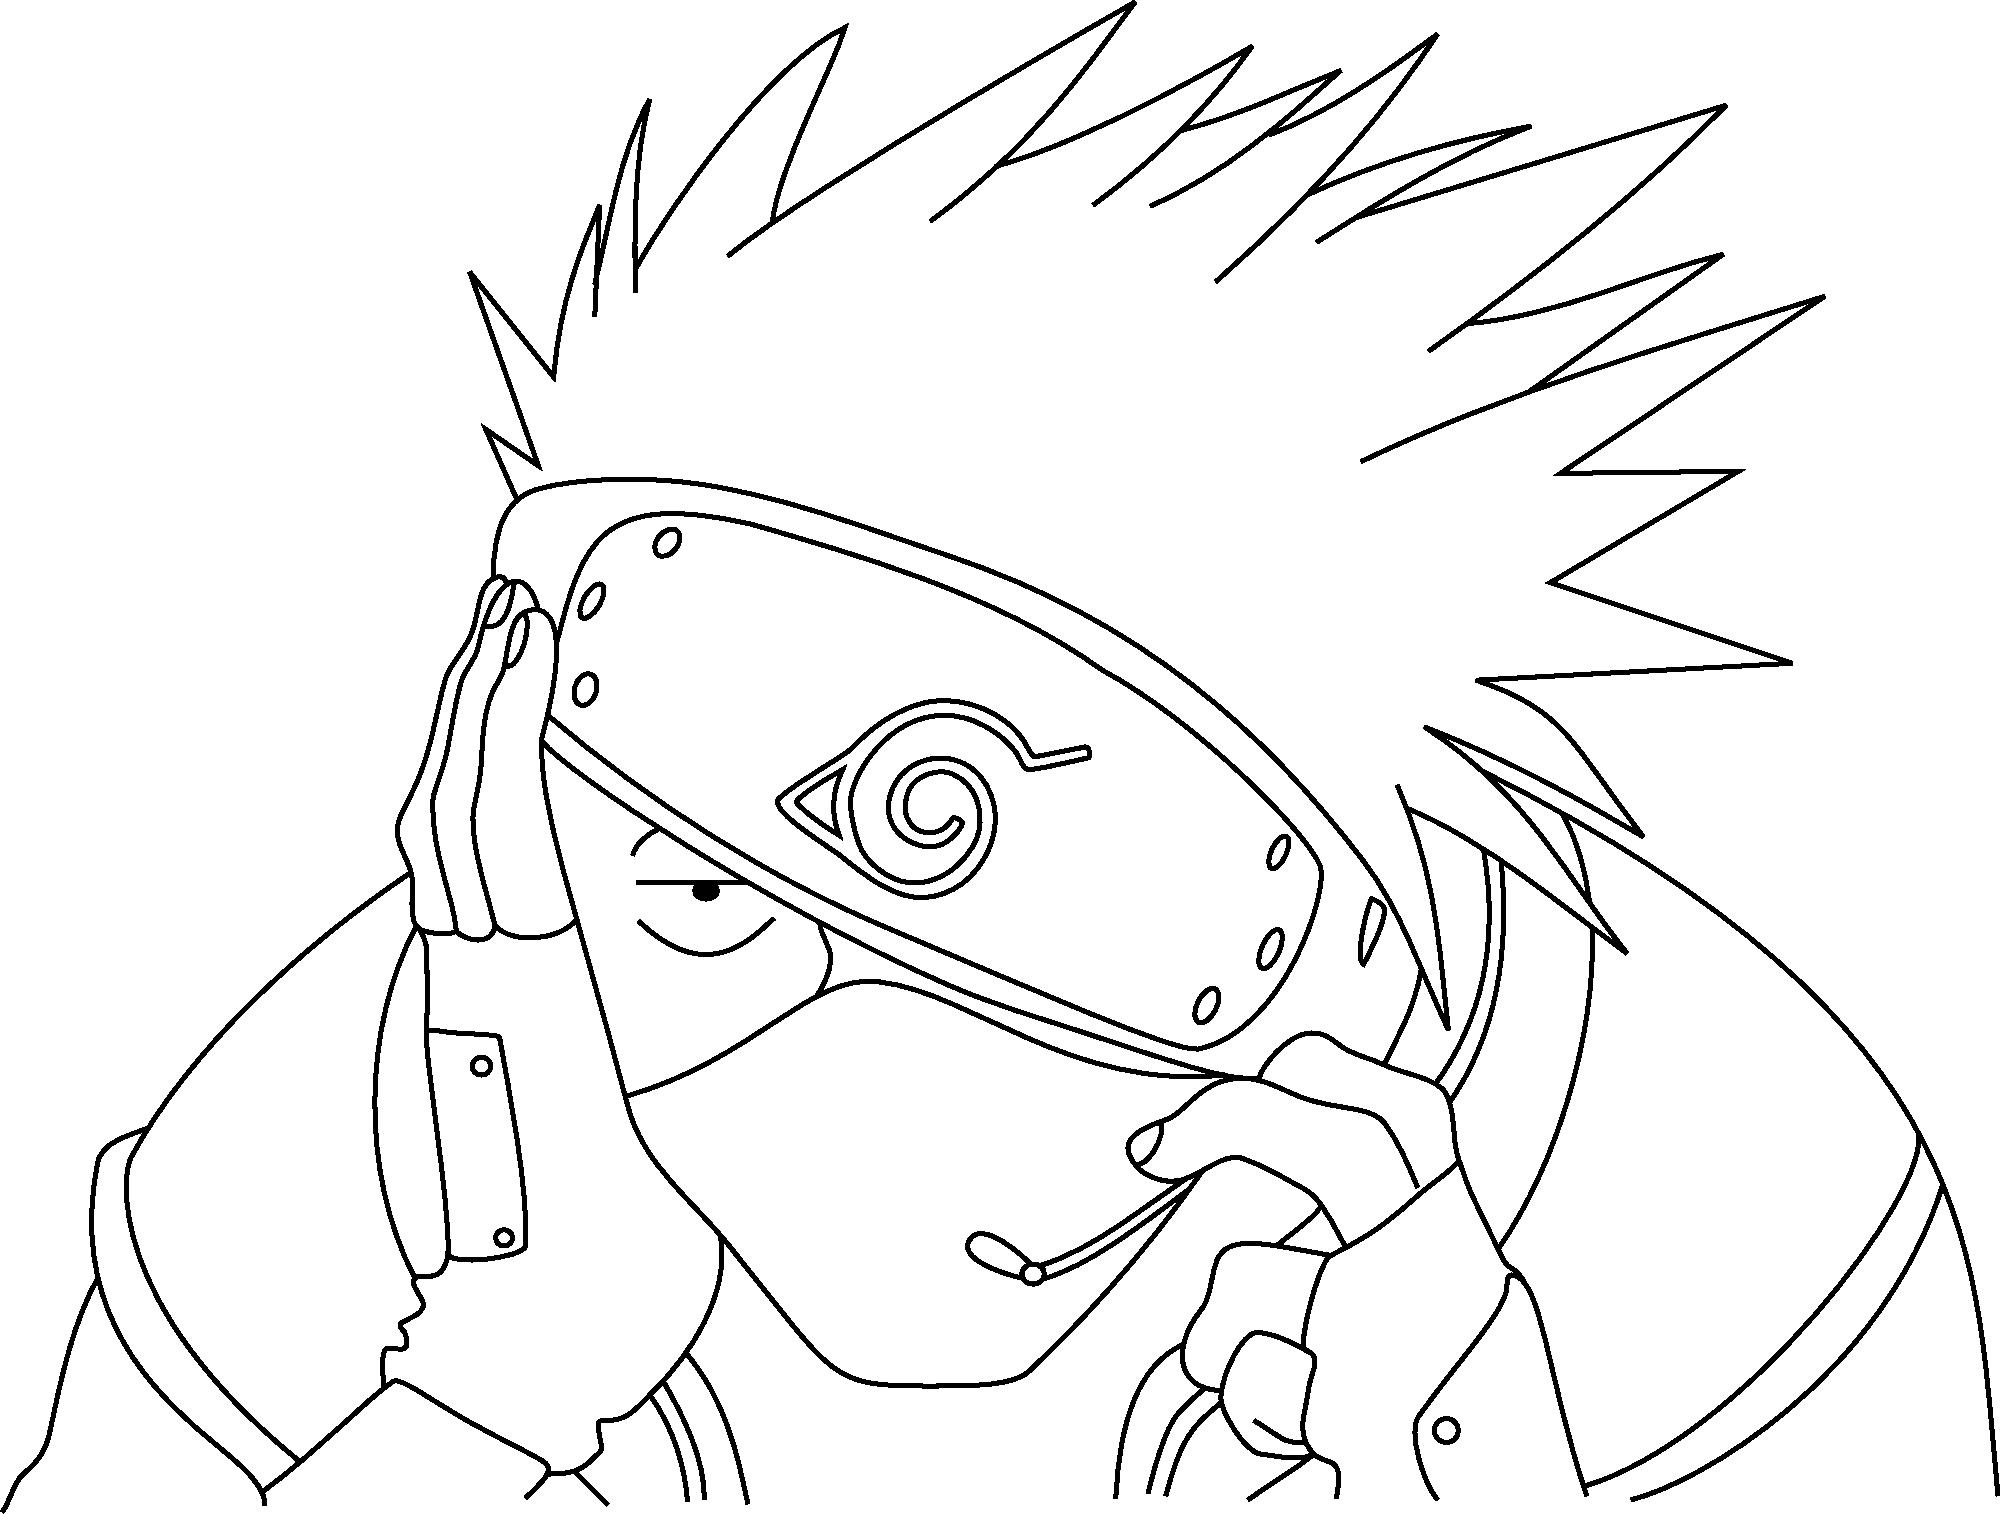 Kakashi Lineart : Kakashi lineart by prinzessinvegeta on deviantart